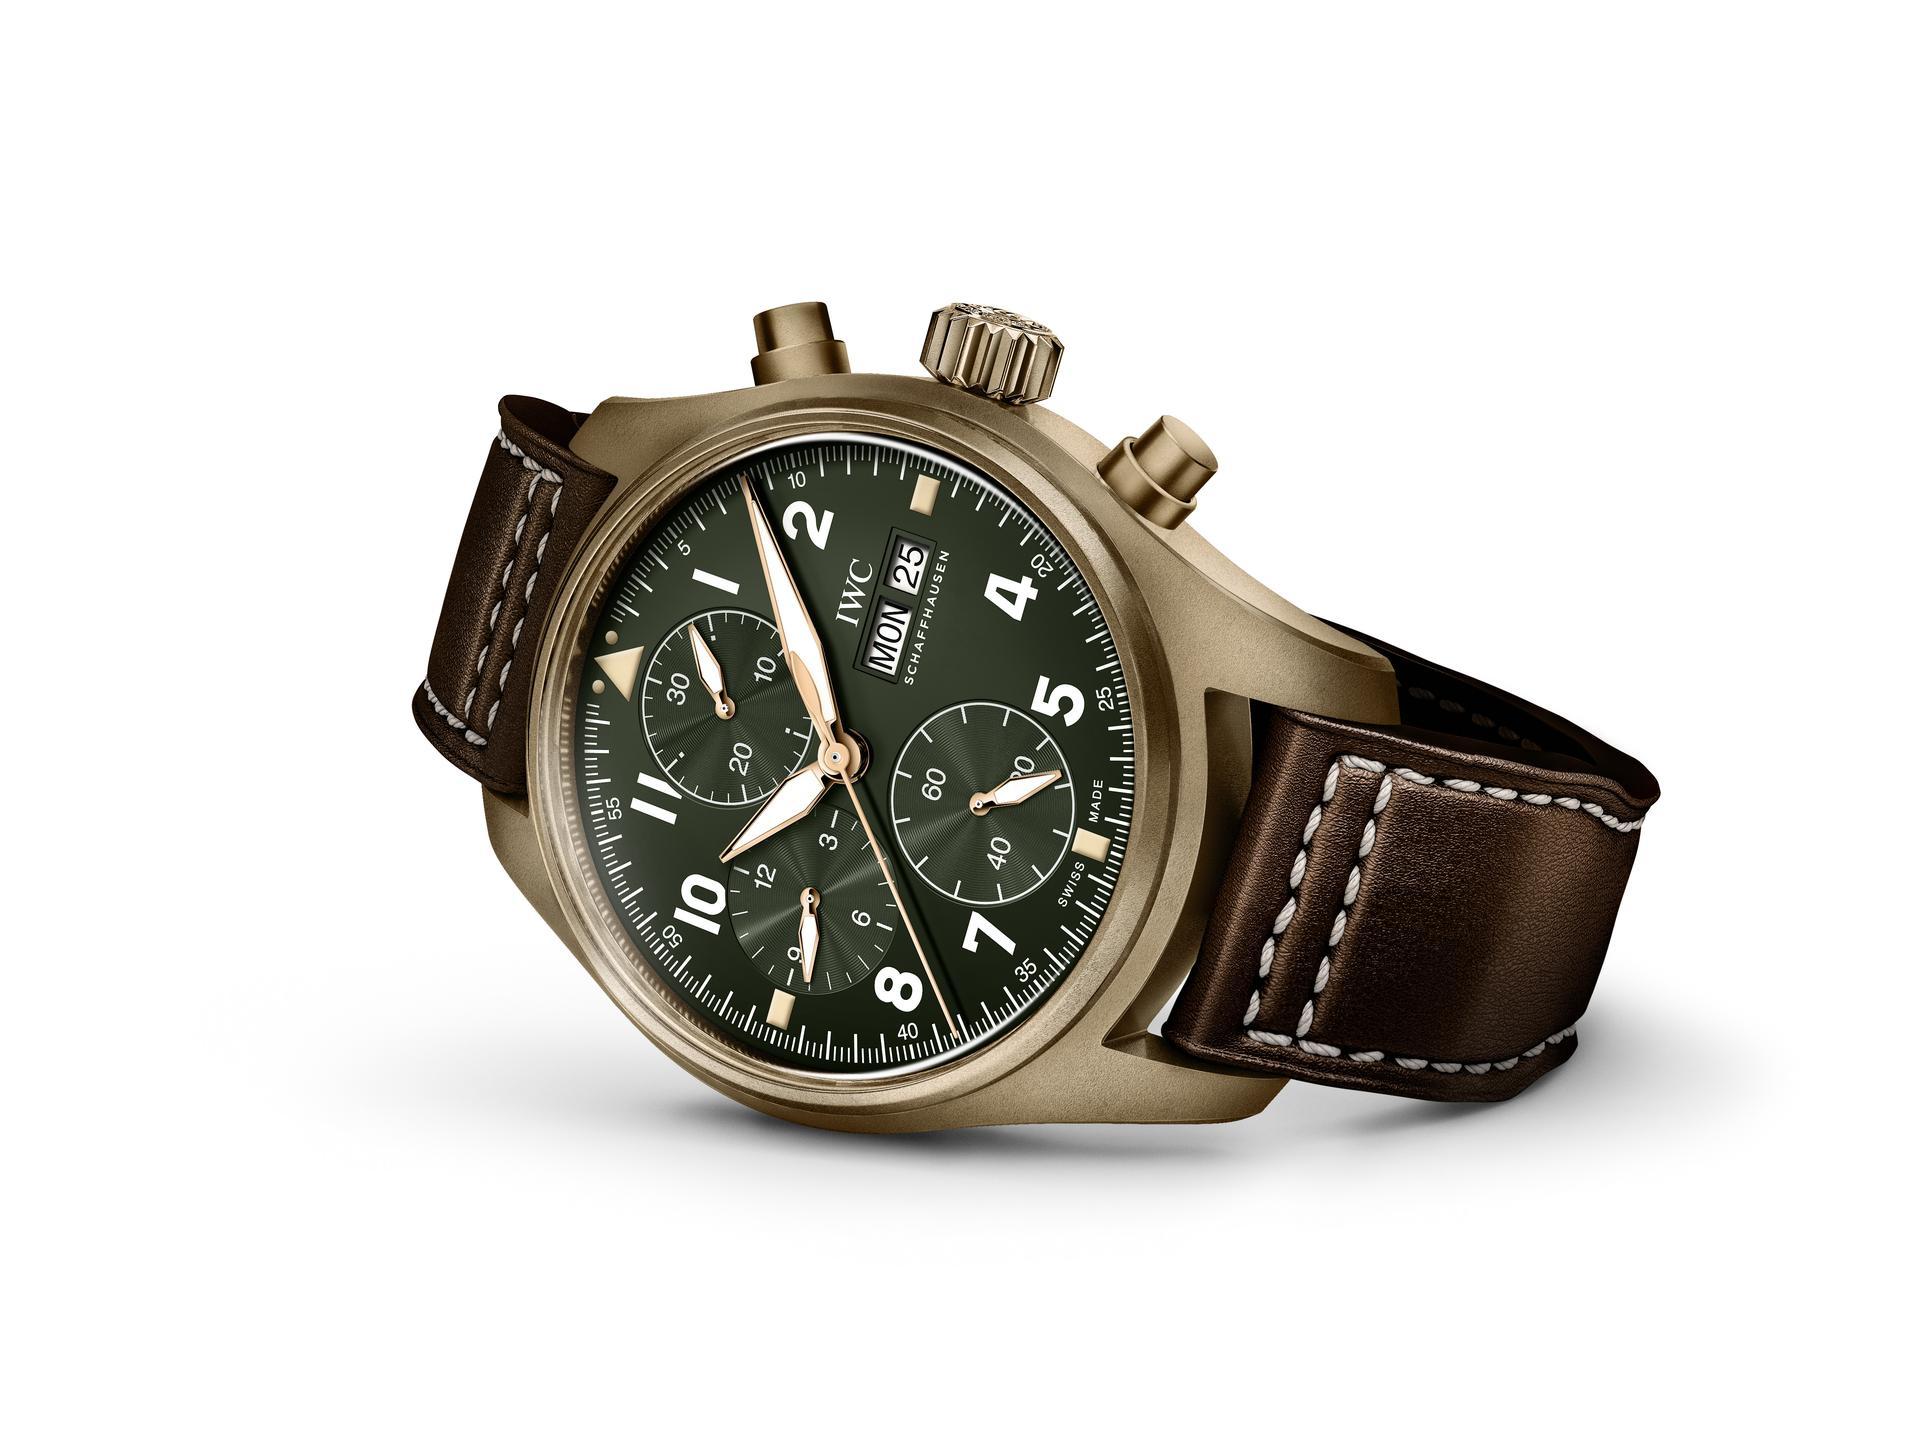 IWC Pilot's Watch Chronograph Spitfire Ref. IW387902